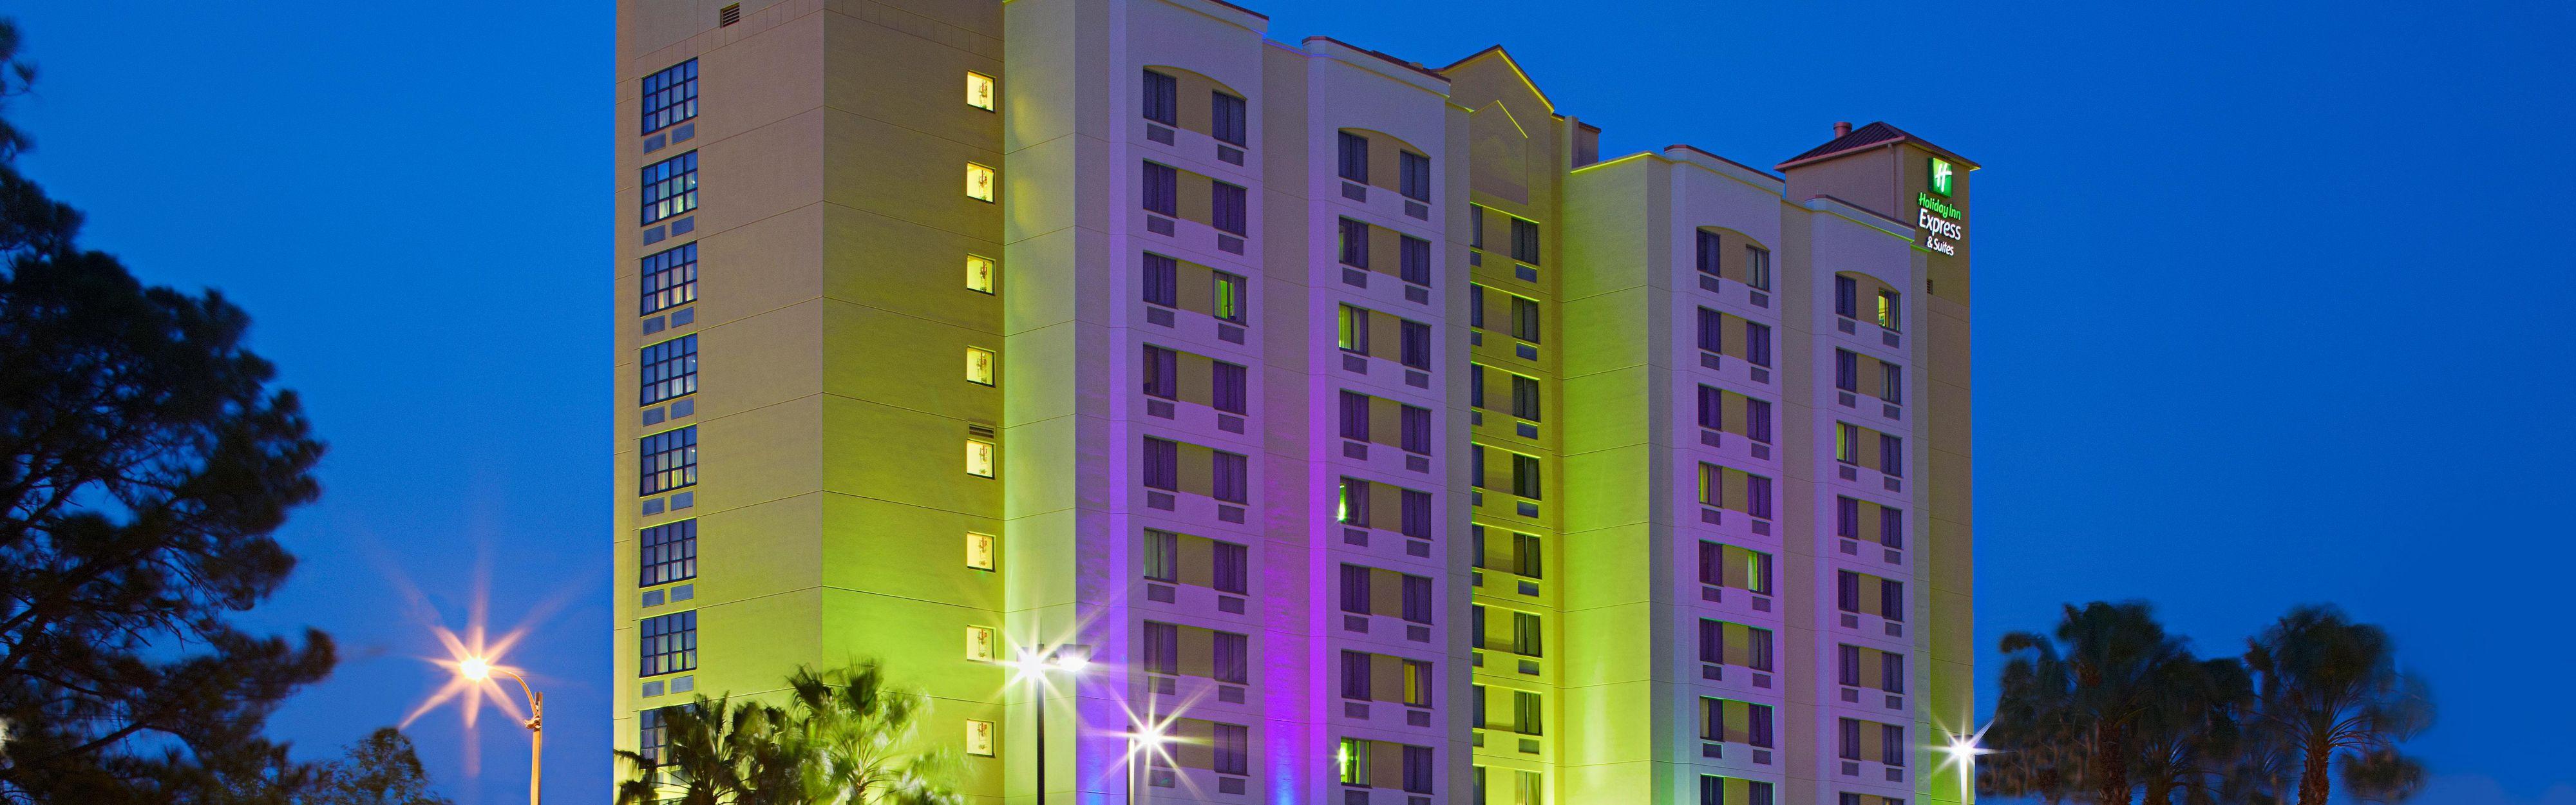 Holiday Inn Express & Suites Nearest Universal Orlando image 0